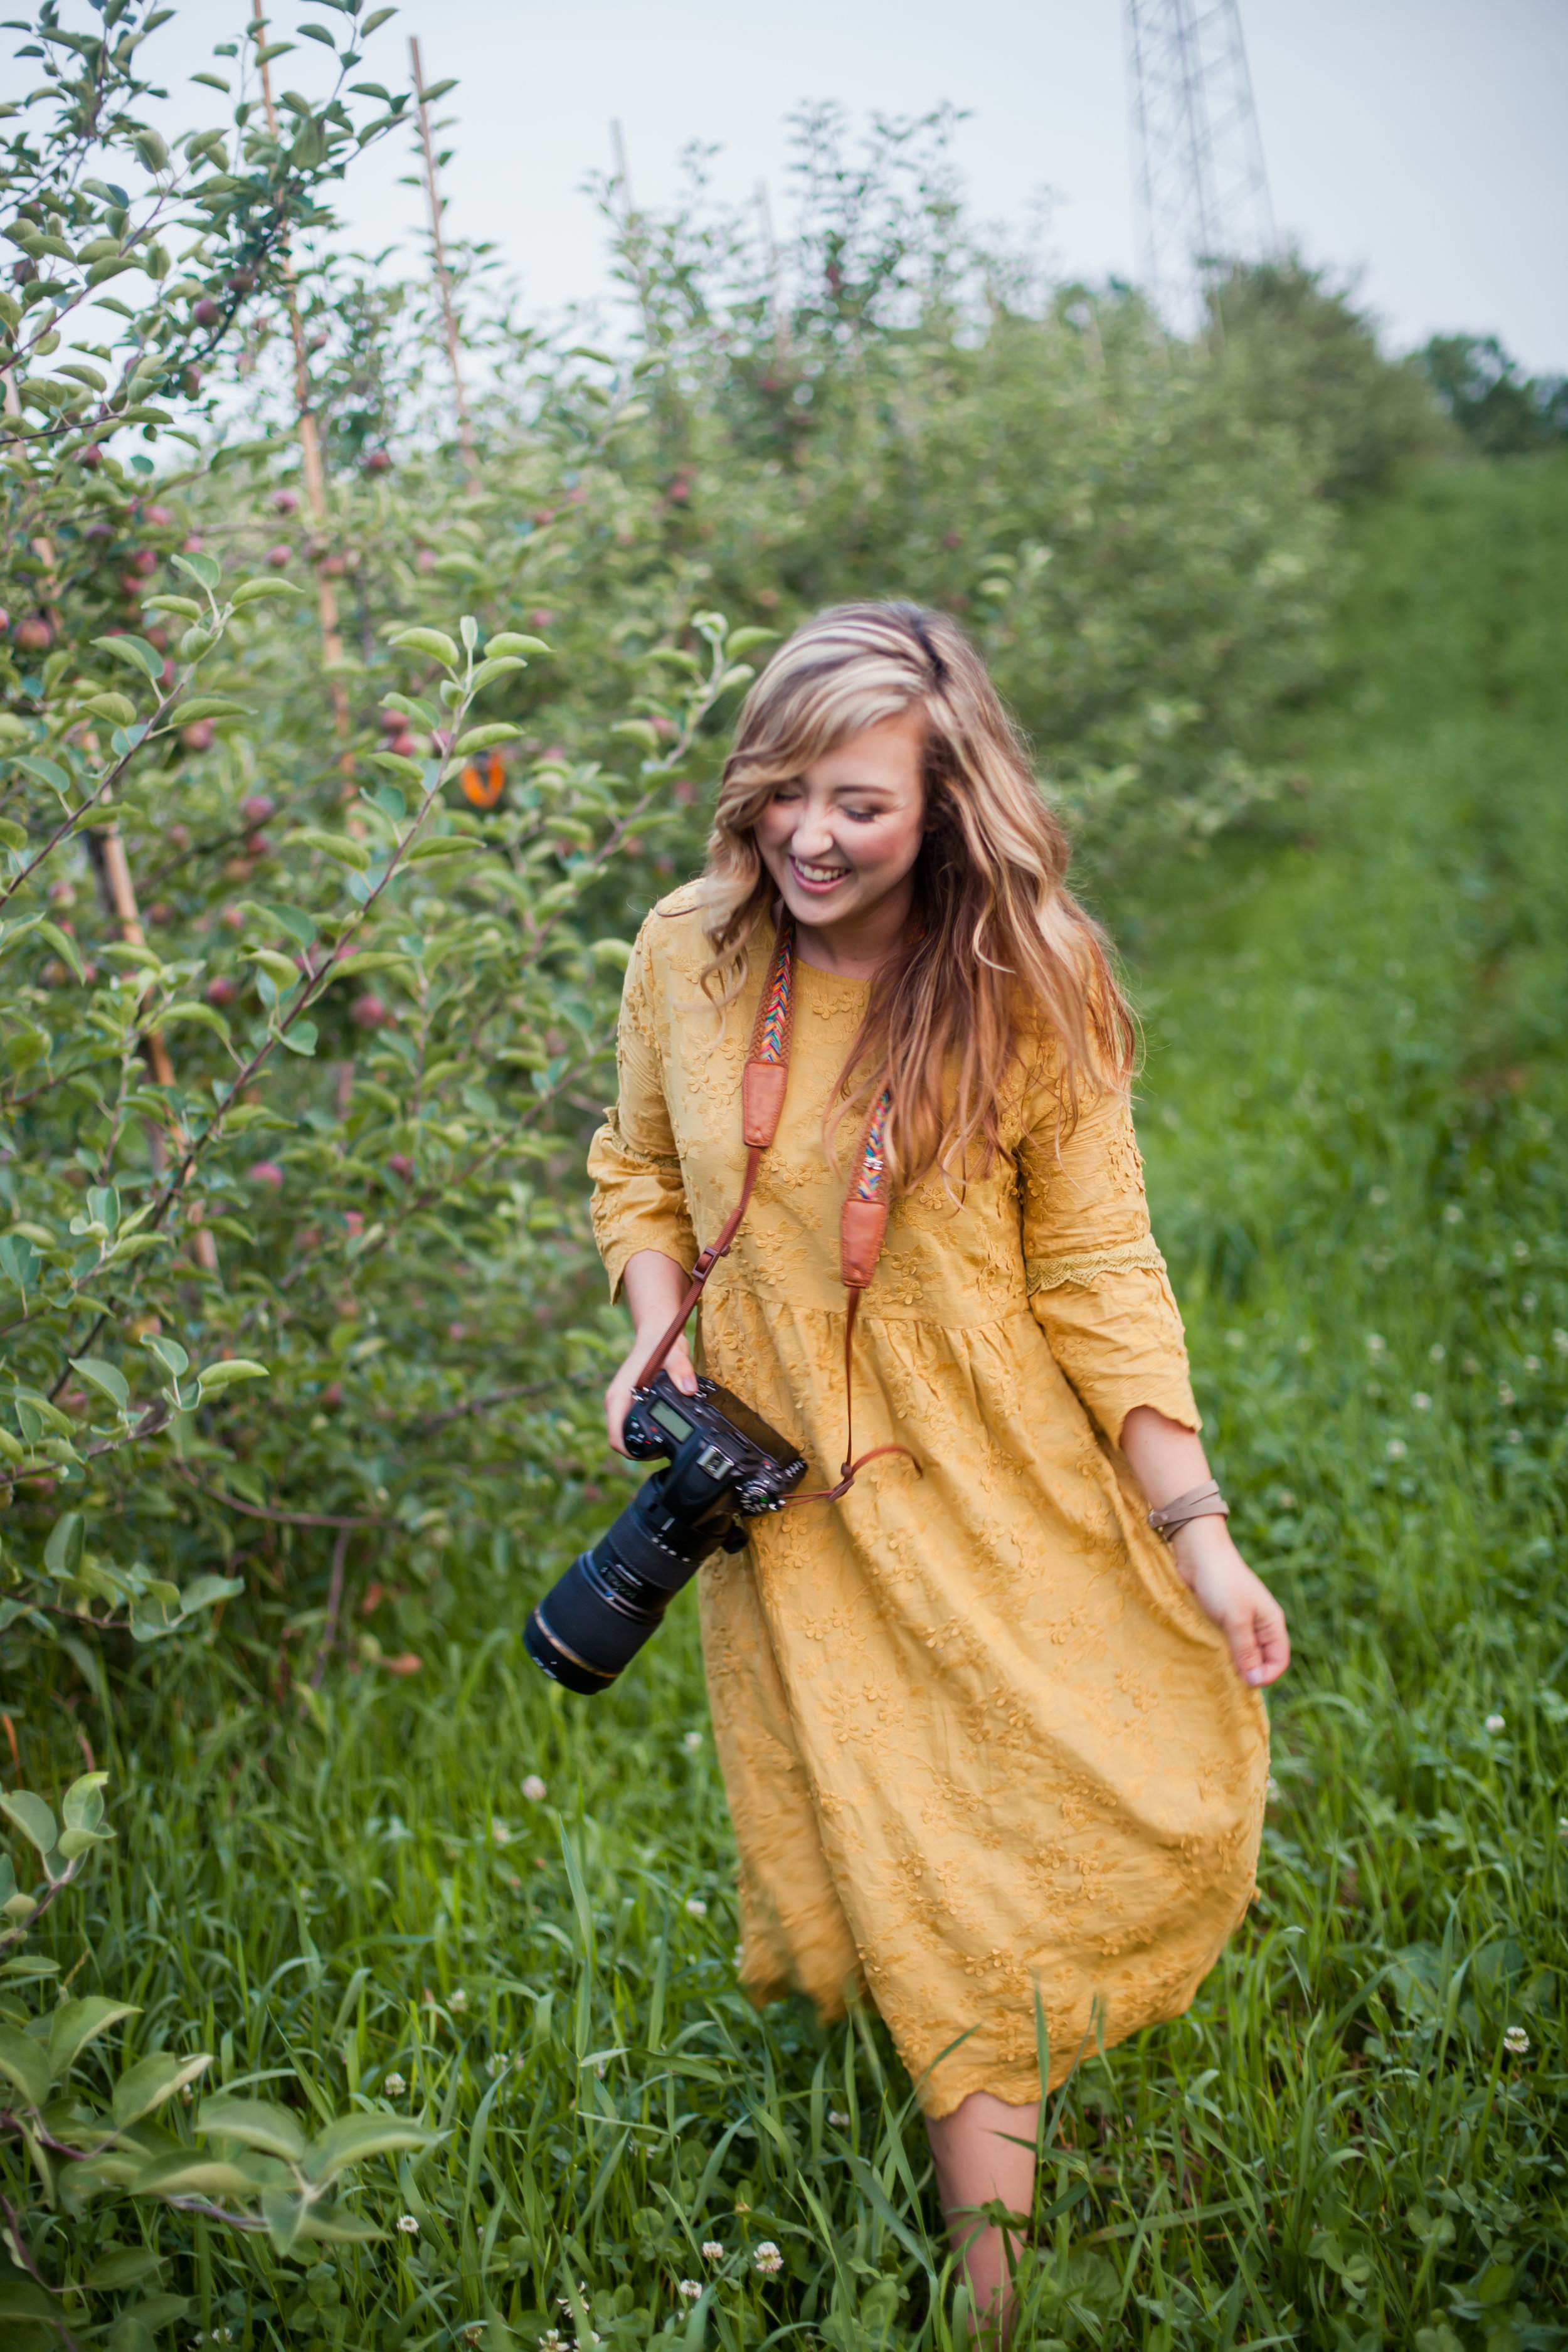 Kyla Jo Photography Muncie Indiana mentoring for photographers photography educaiton